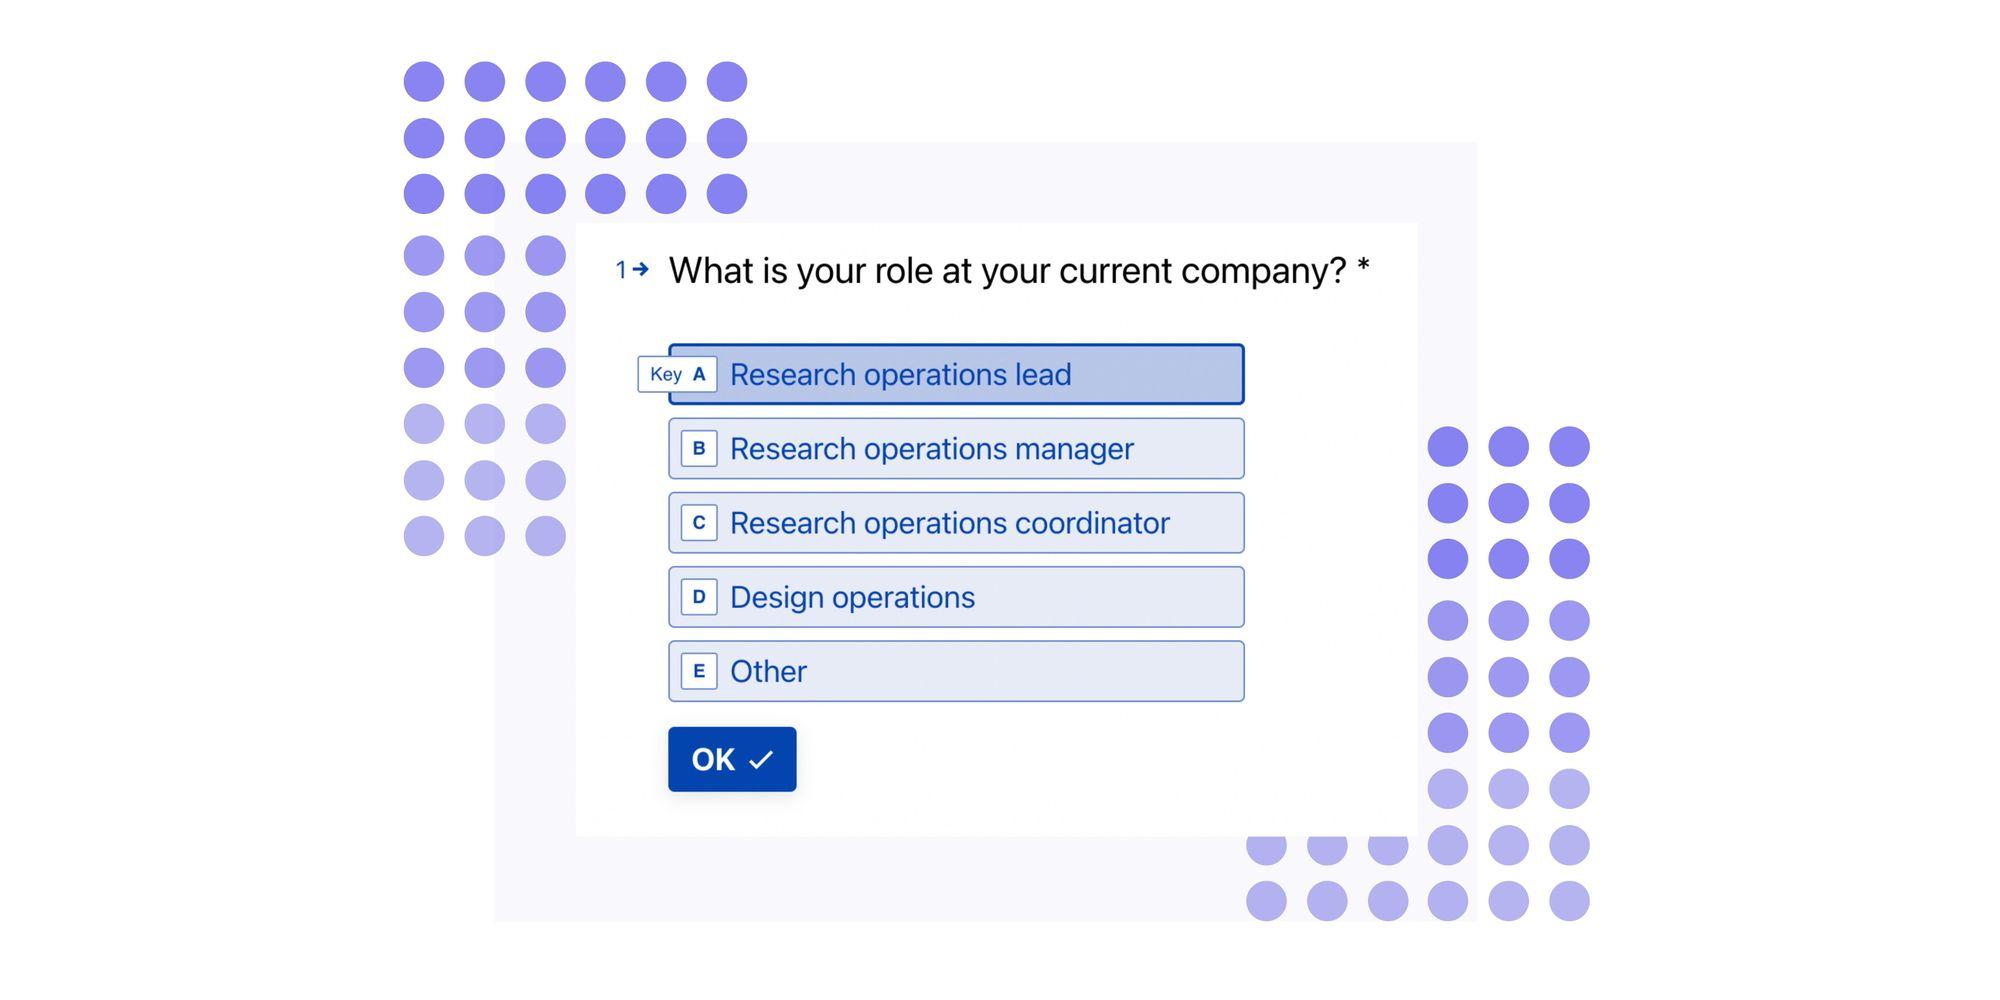 Screener survey question example